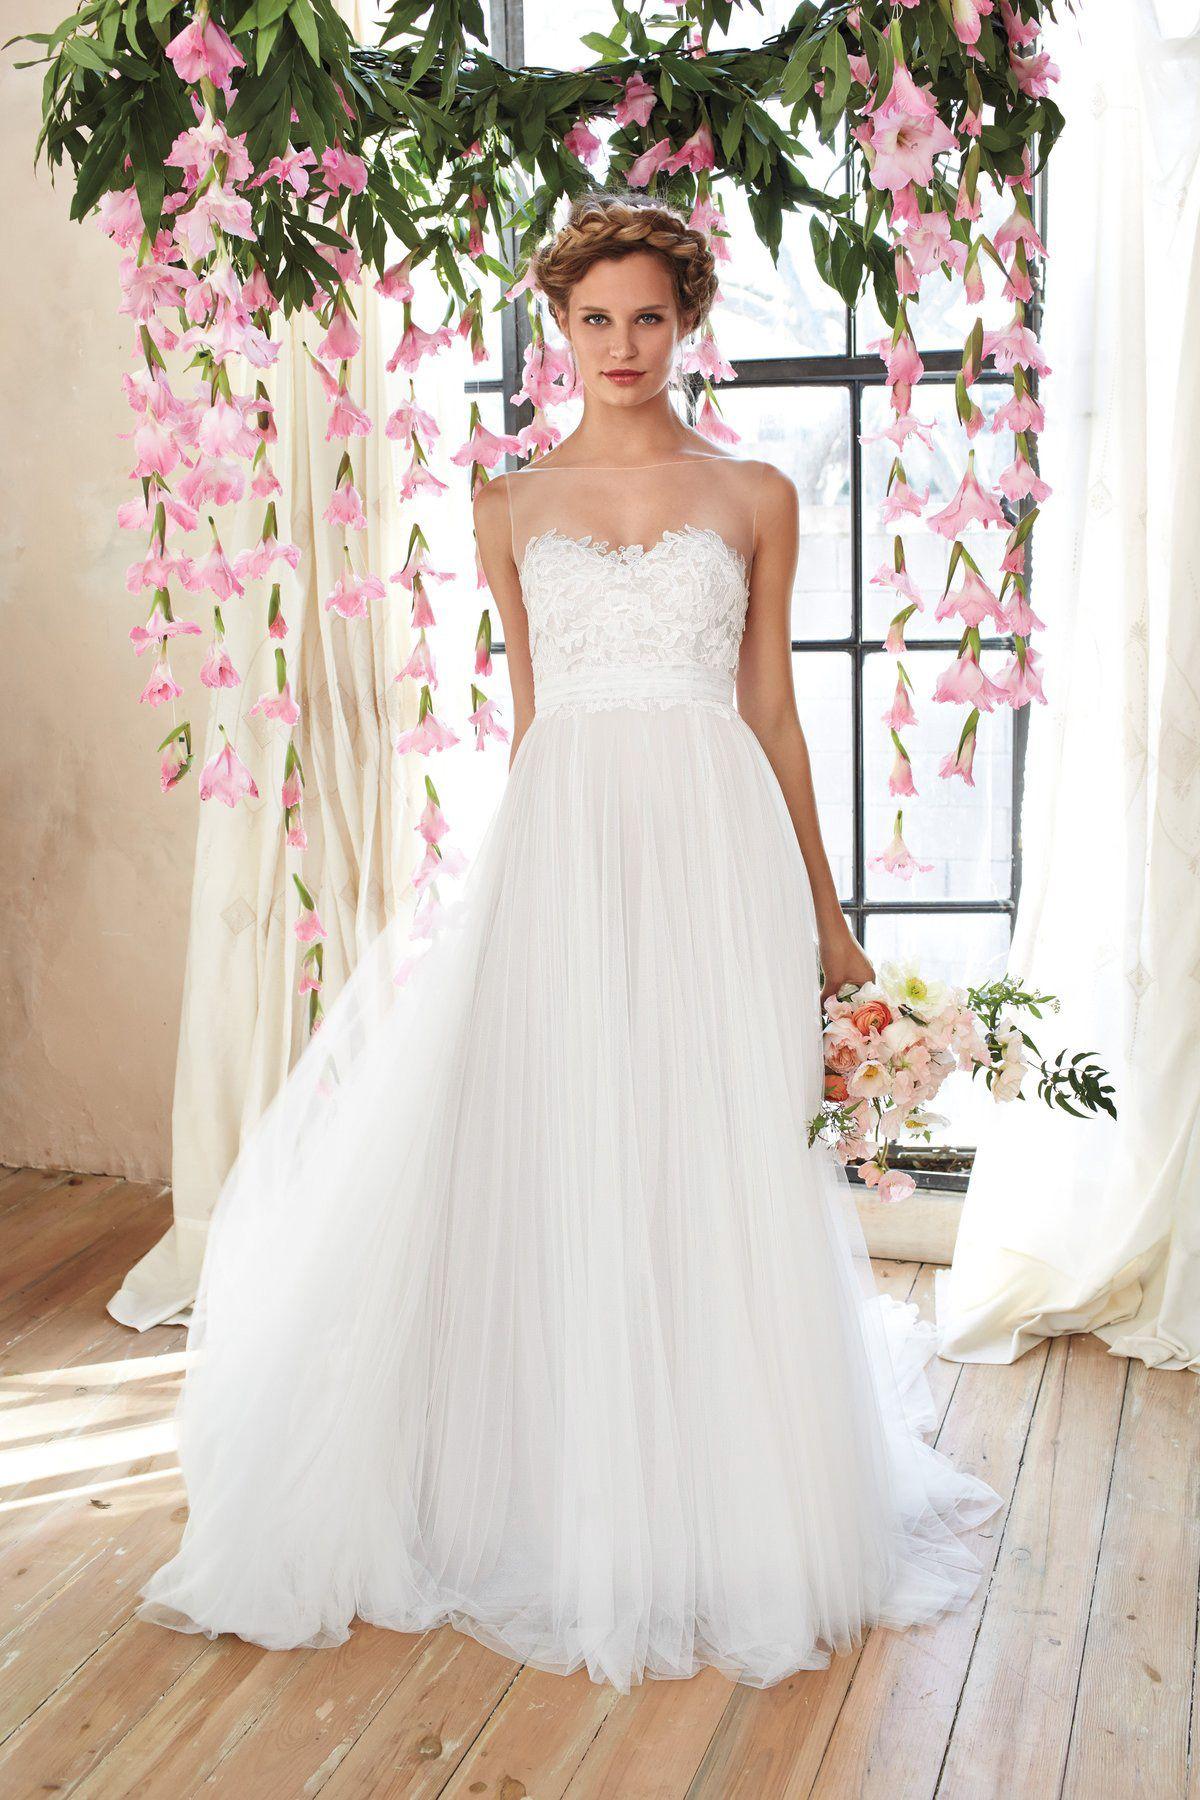 Willowby Dress Penelope  Felichia Bridal 601 College St., Toronto, Ontario, M6G 1B5, CANADA Phone: 647-350-5559  Dress Penelope style 53707